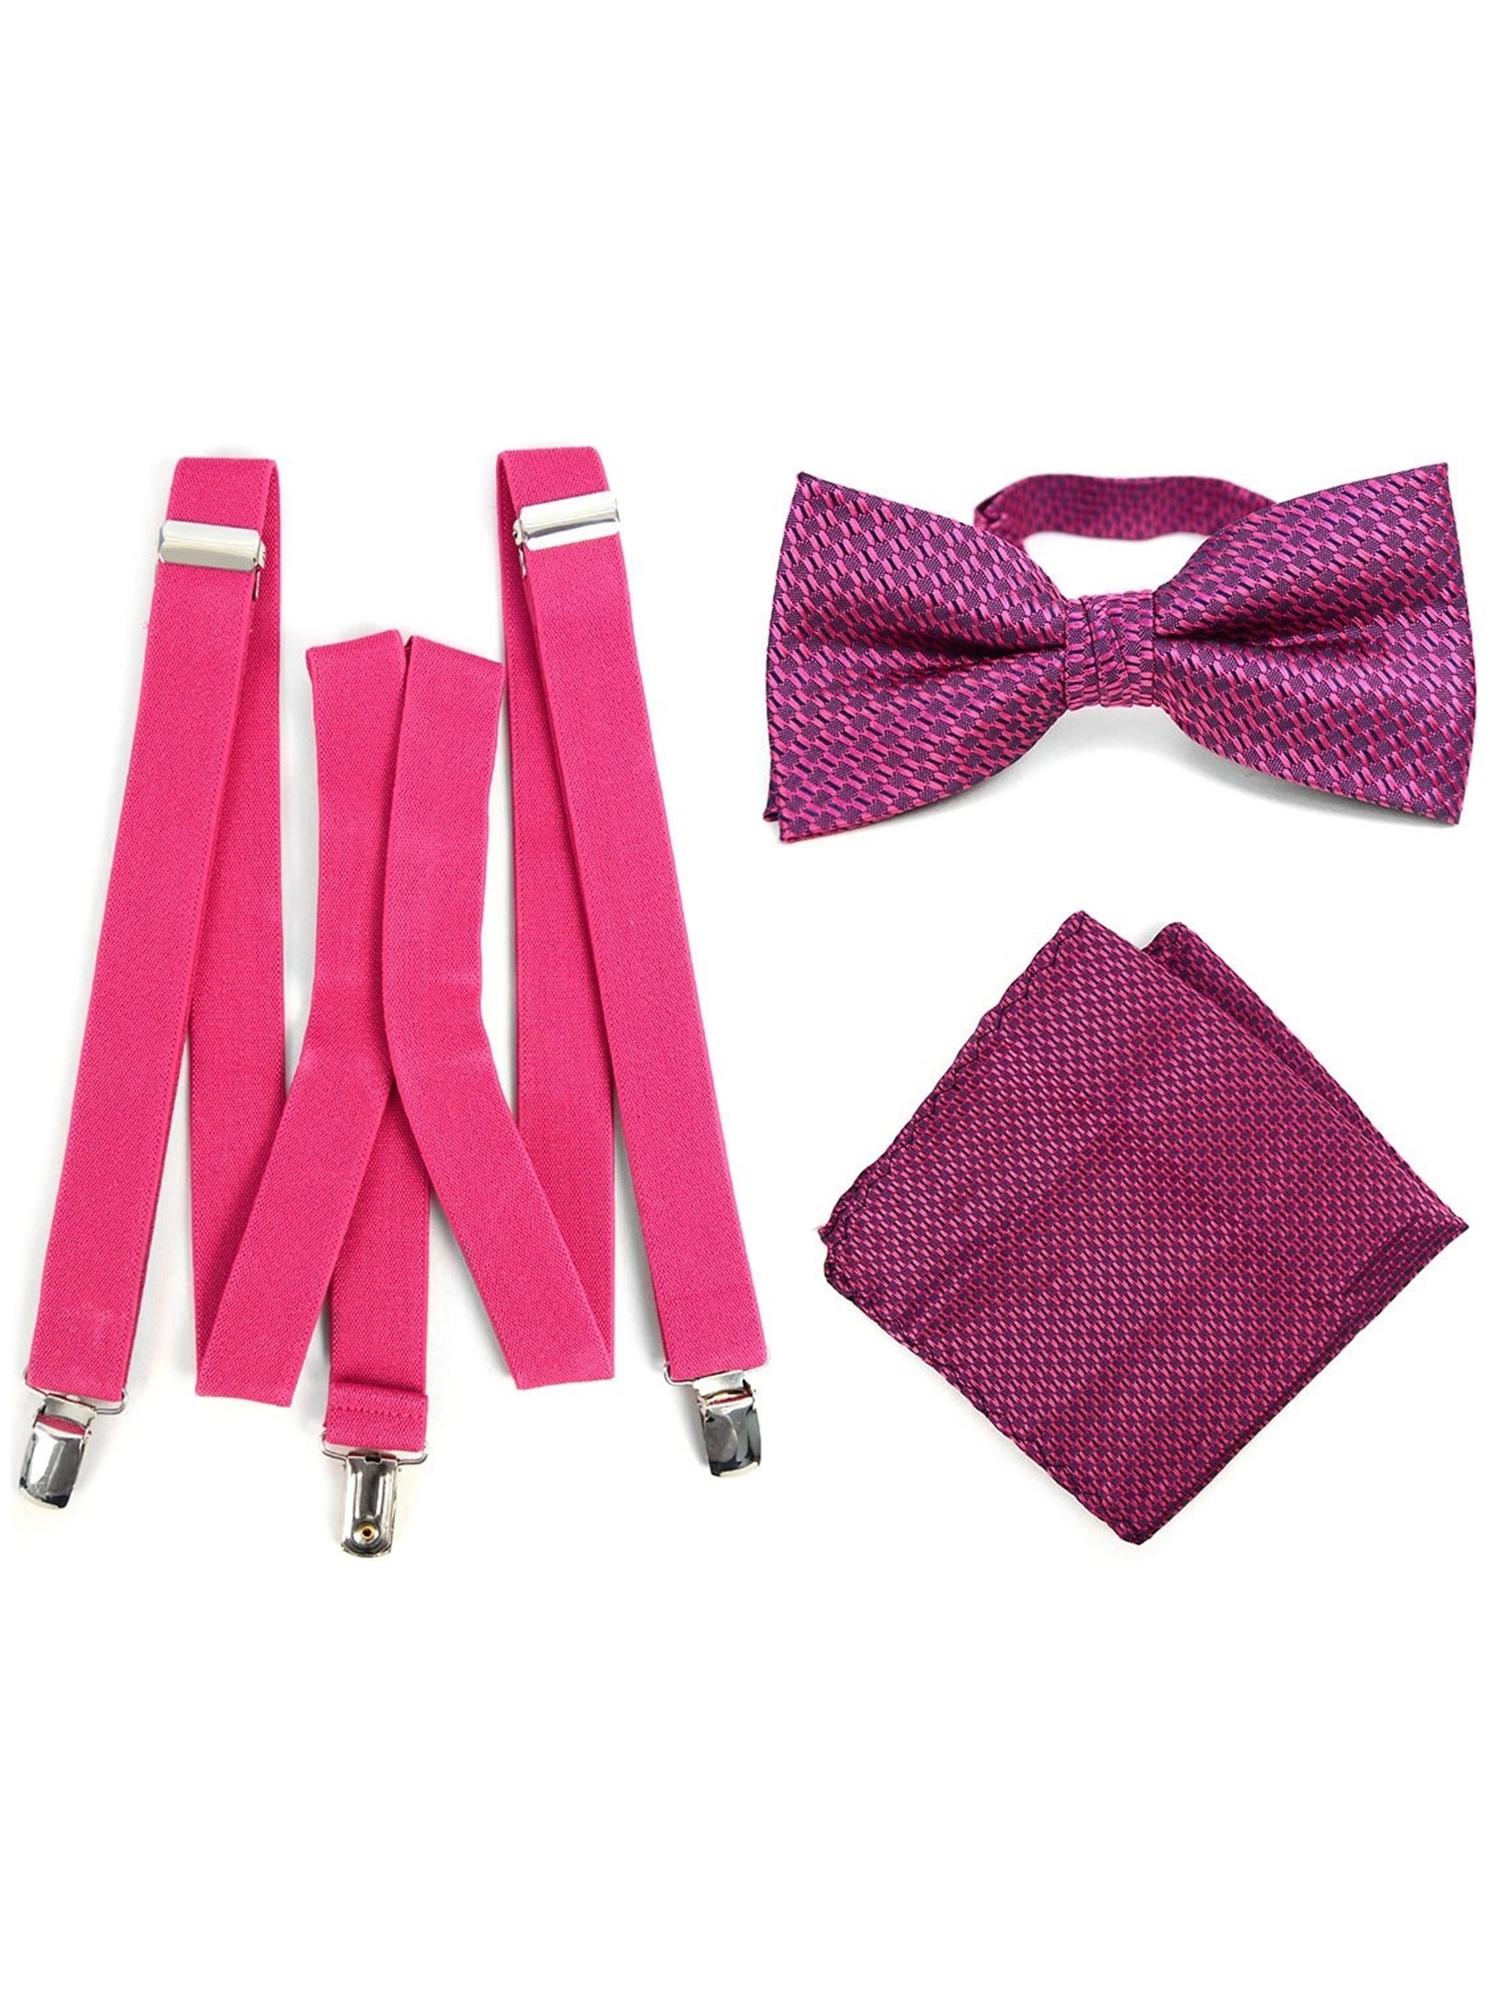 7375546cef7f Men's Fuchsia 3 PC Clip-on Suspenders, Bow Tie & Hanky Sets | eBay